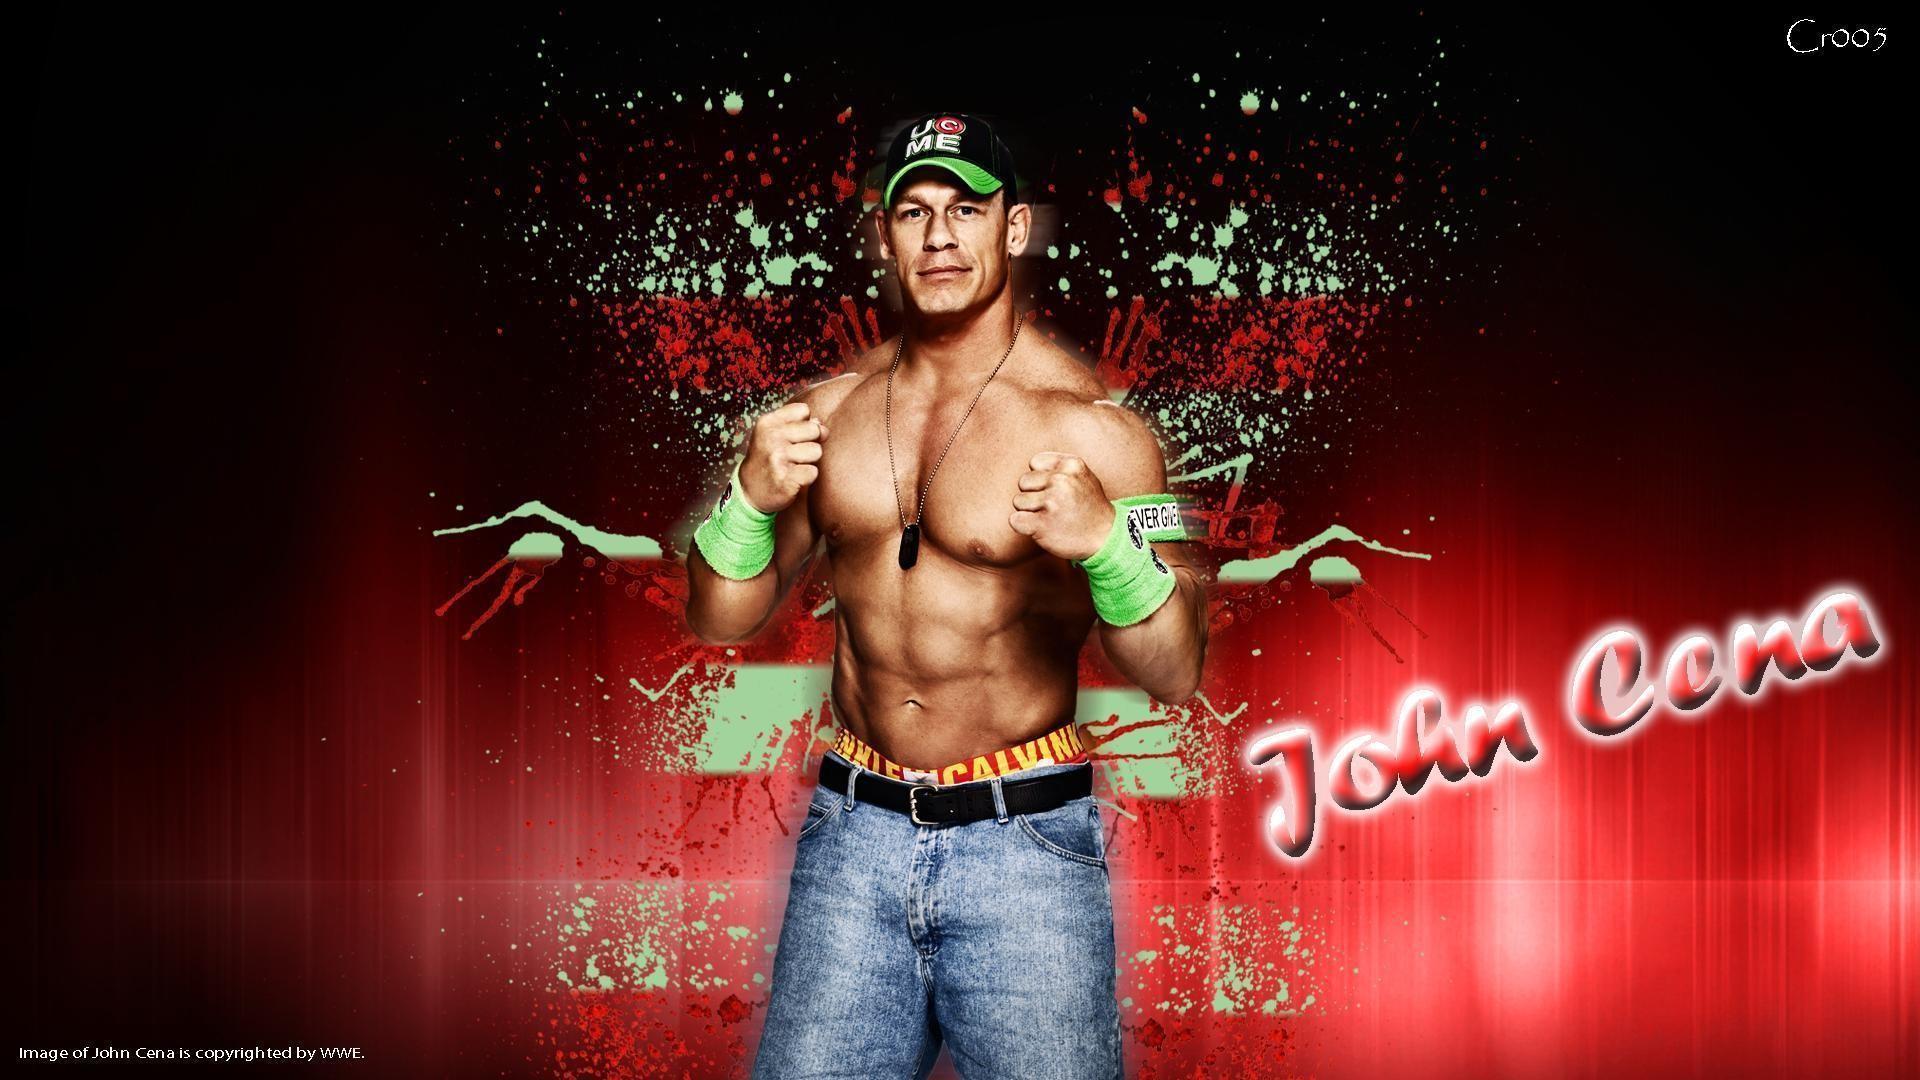 Free Download 17 WWE John Cena HD Wallpapers